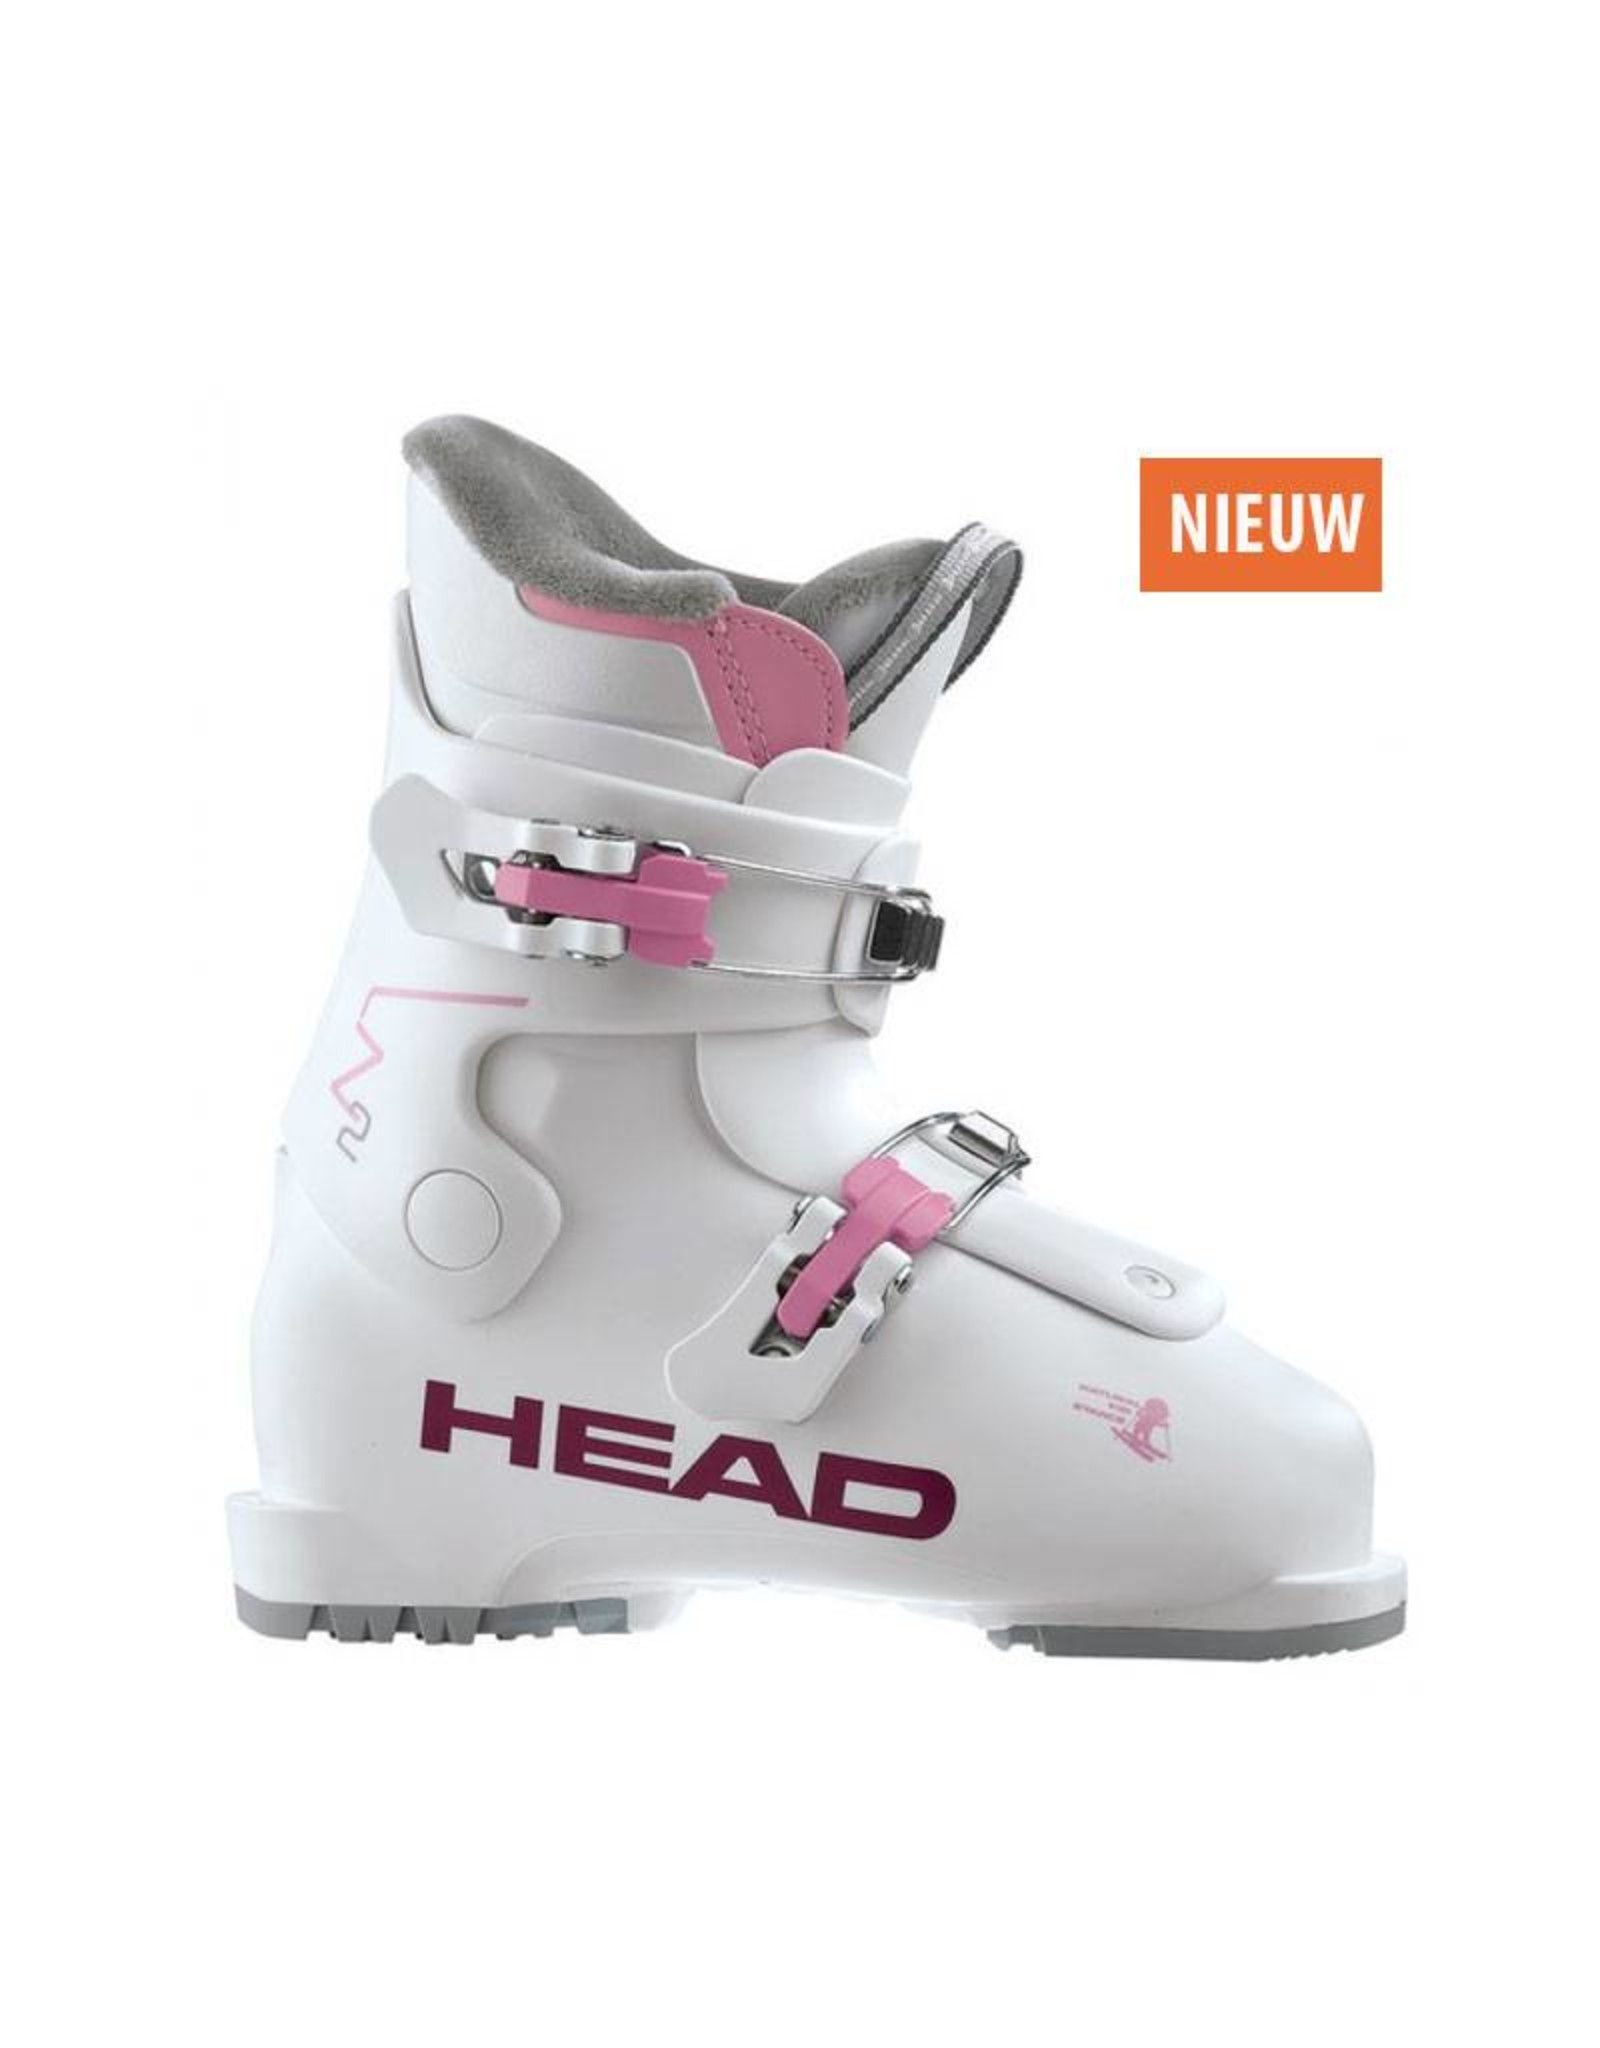 HEAD Skischoenen HEAD Z2 White/Pink NIEUW